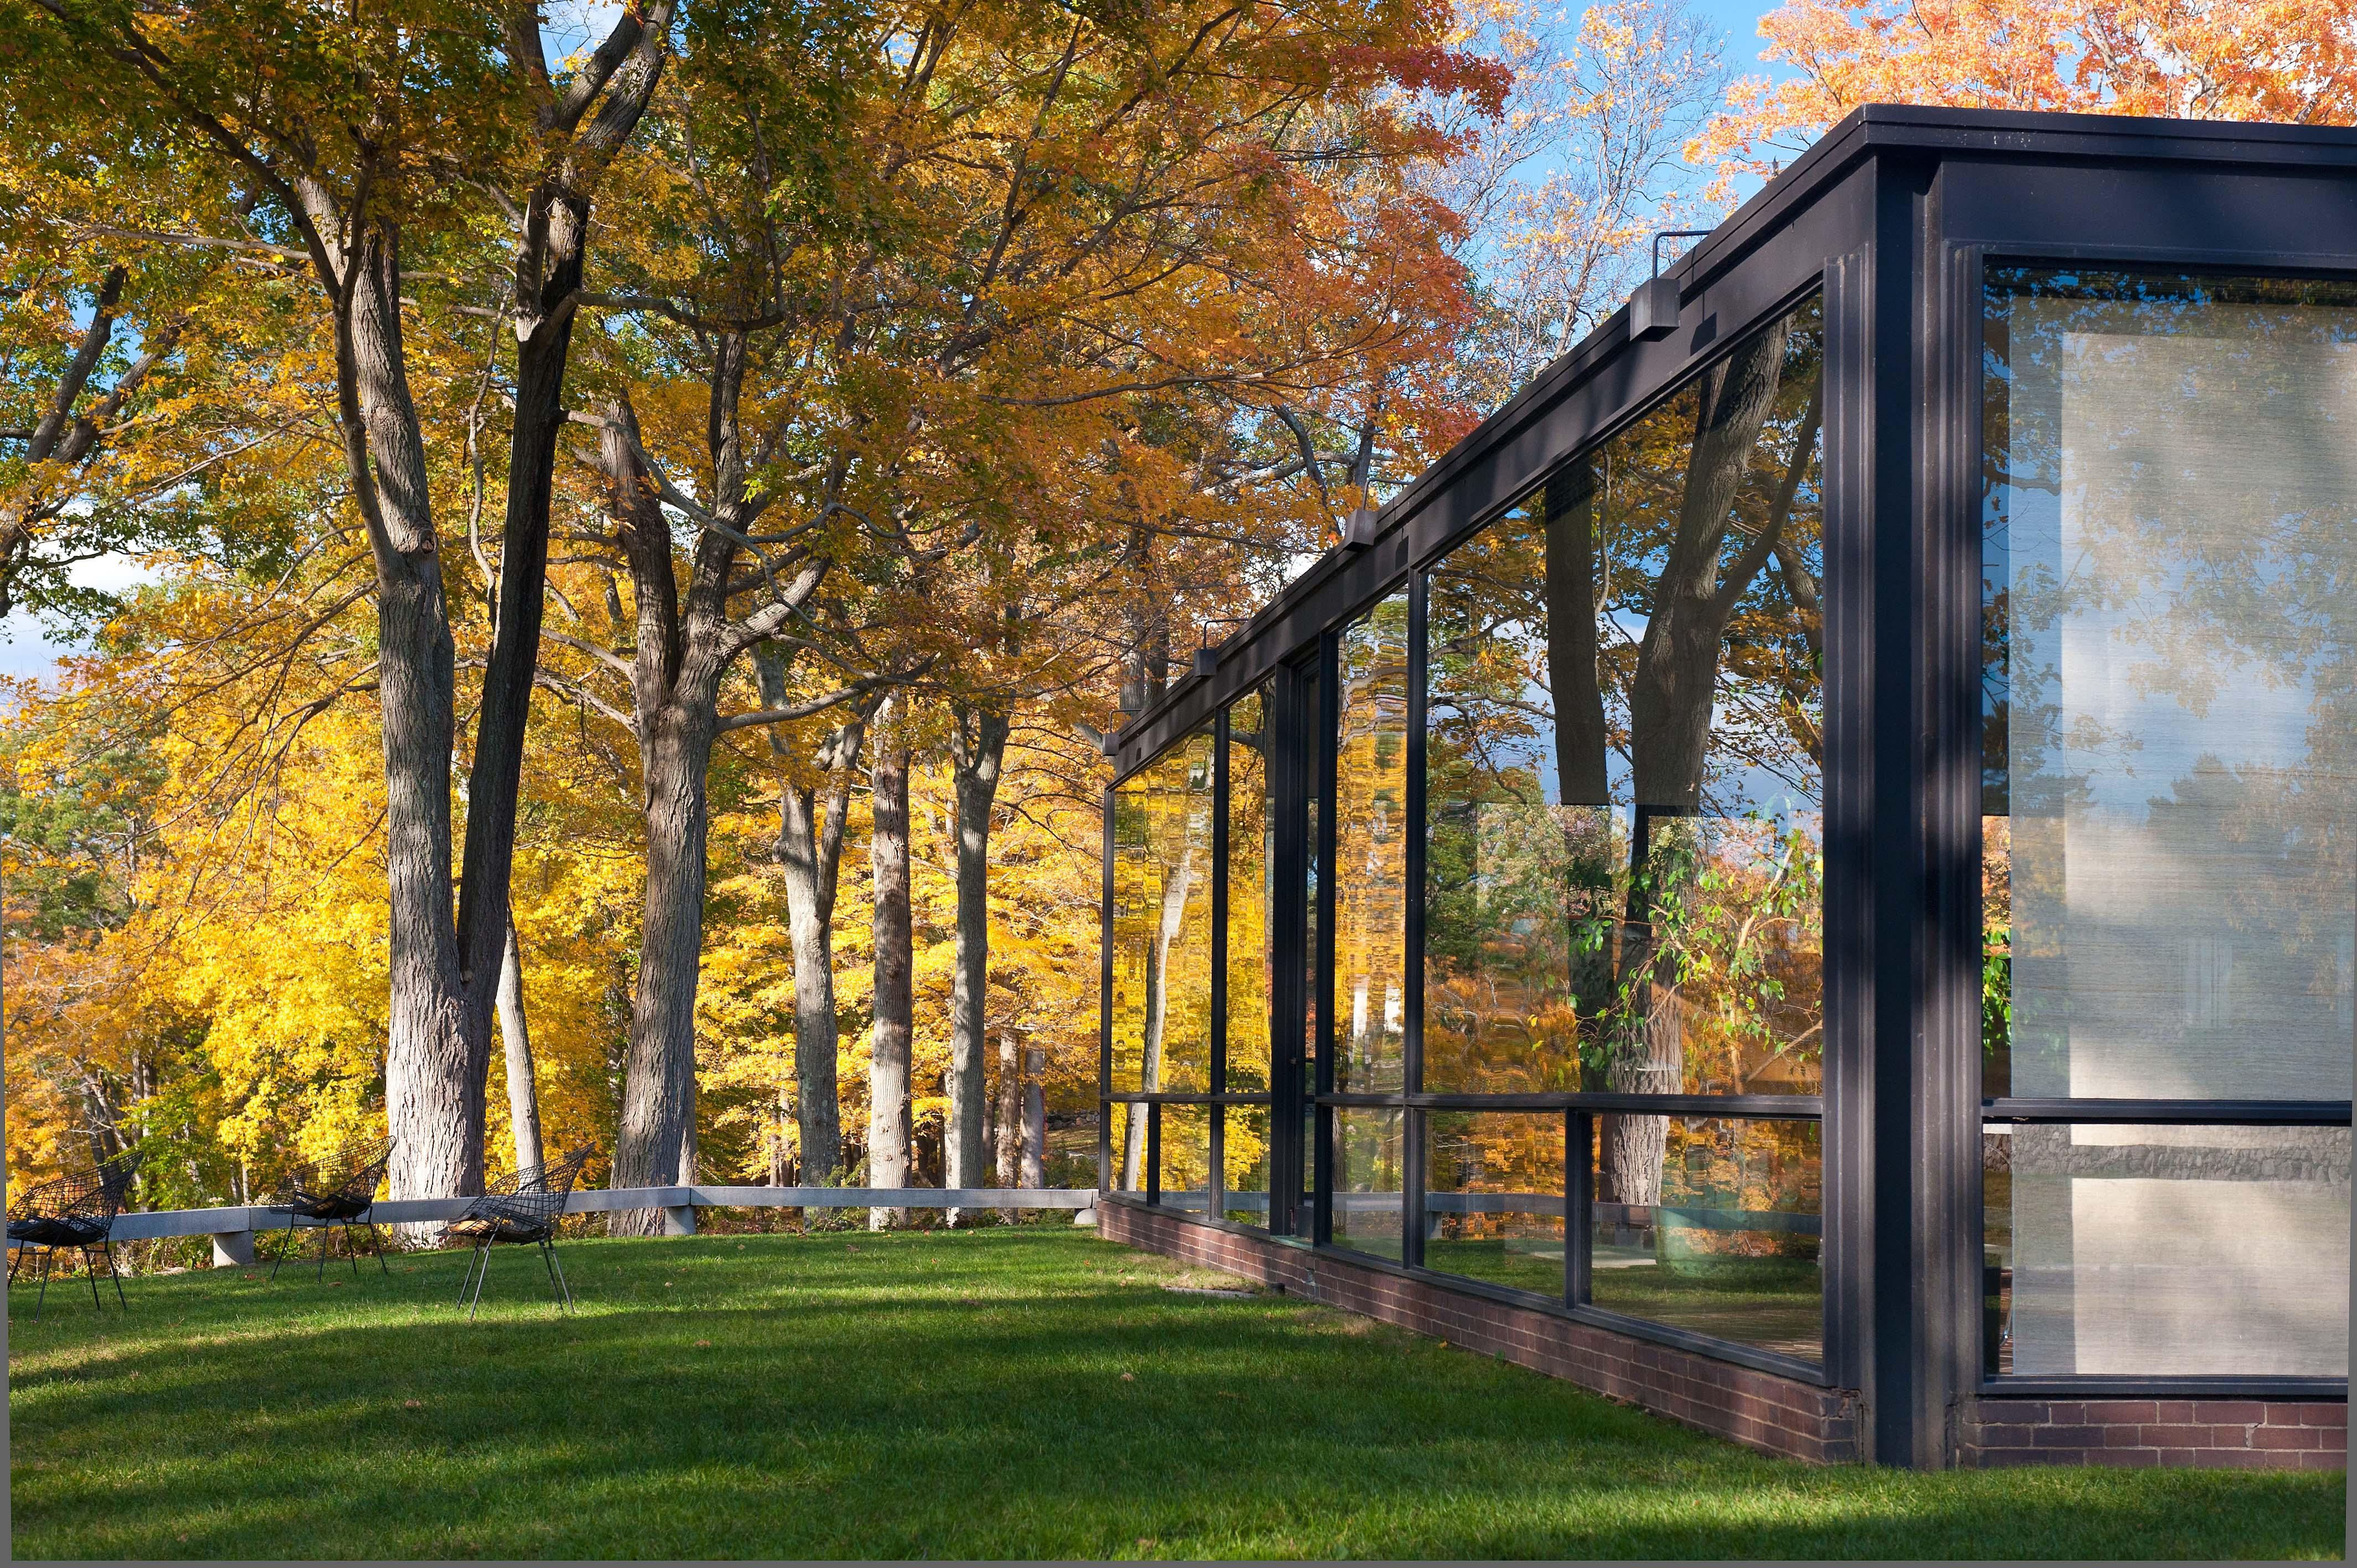 Philip Johnson Glass House philip johnson's glass house | blake robinson photography